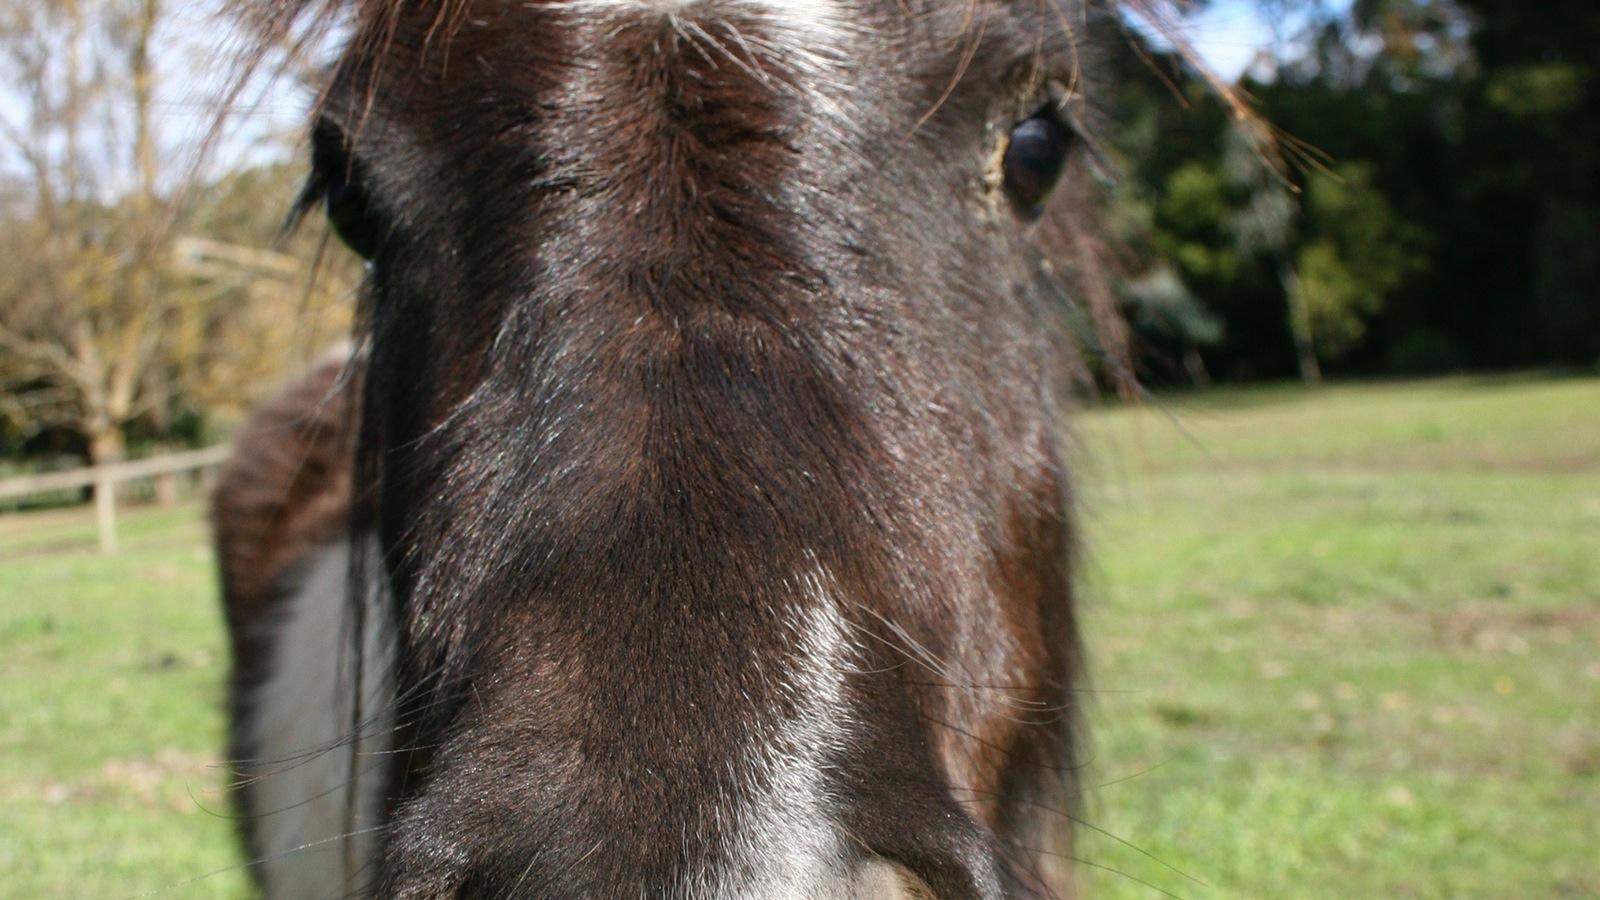 Adorable ponies